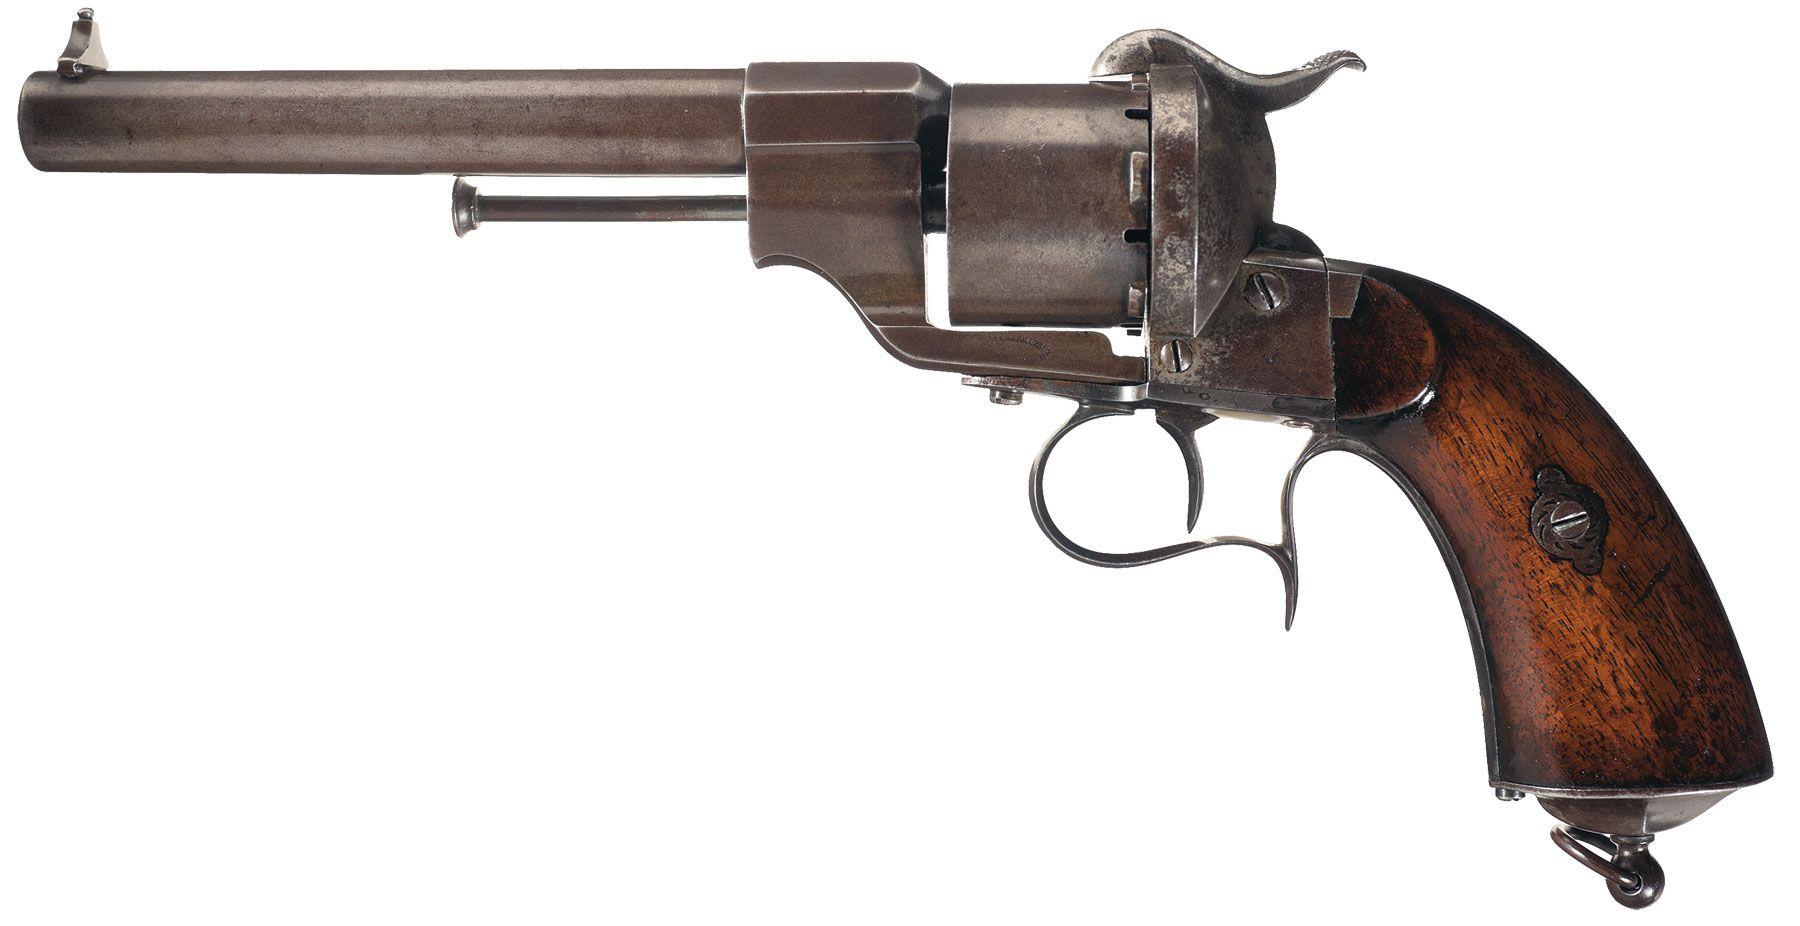 Double pistol handgun revolver gun display case cabinet rack shadowbox - 1800 Revolvers Google Search